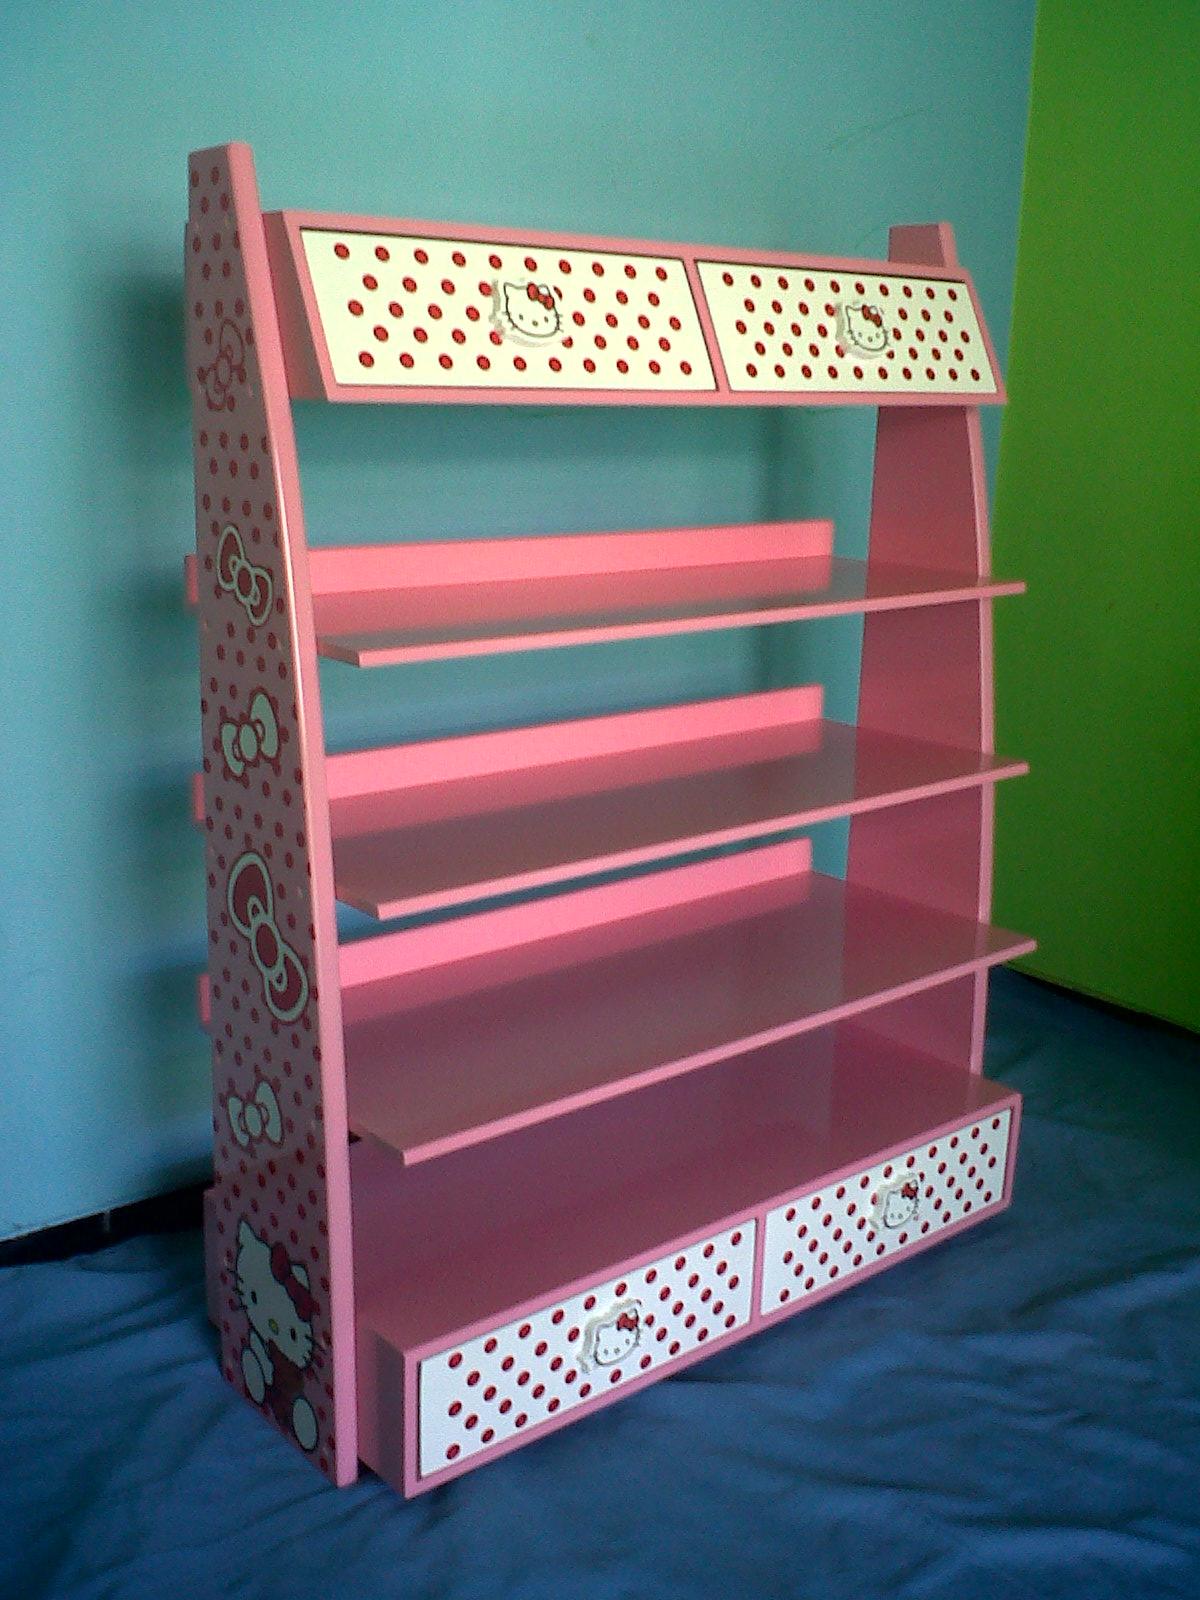 Lemari Sepatu Anak Serbaguna Daftar Harga Terkini Dan Rak Amazing Jilbab 1299 Gram Hello Kitty